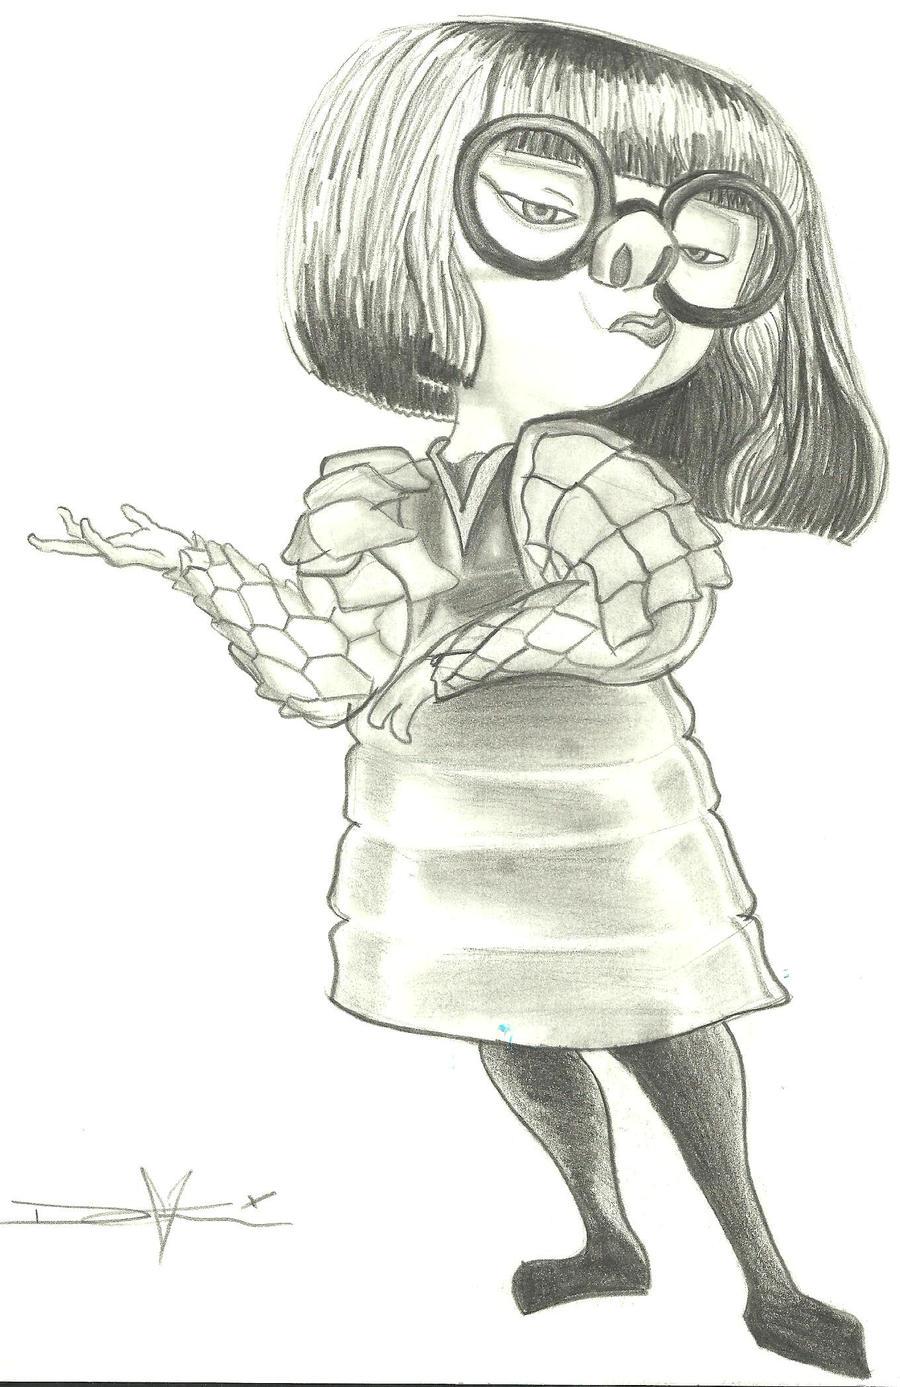 Edna Mode The Incredibles By Stencilgirl On Deviantart